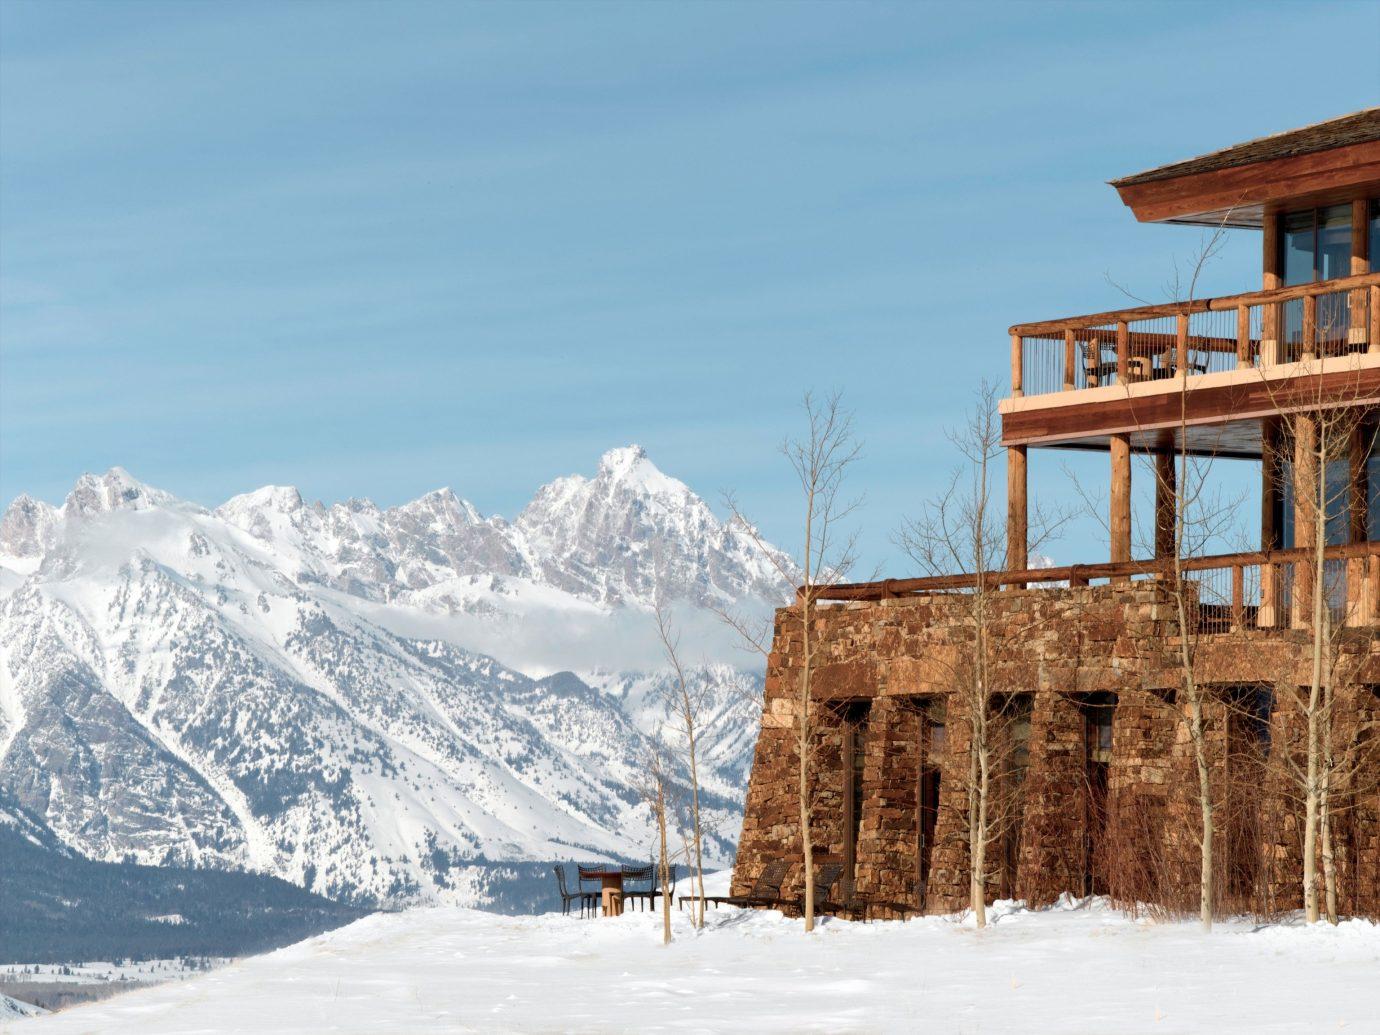 Hotels Luxury Travel Mountains + Skiing Trip Ideas sky snow outdoor mountain Winter season Resort Nature mountain range piste